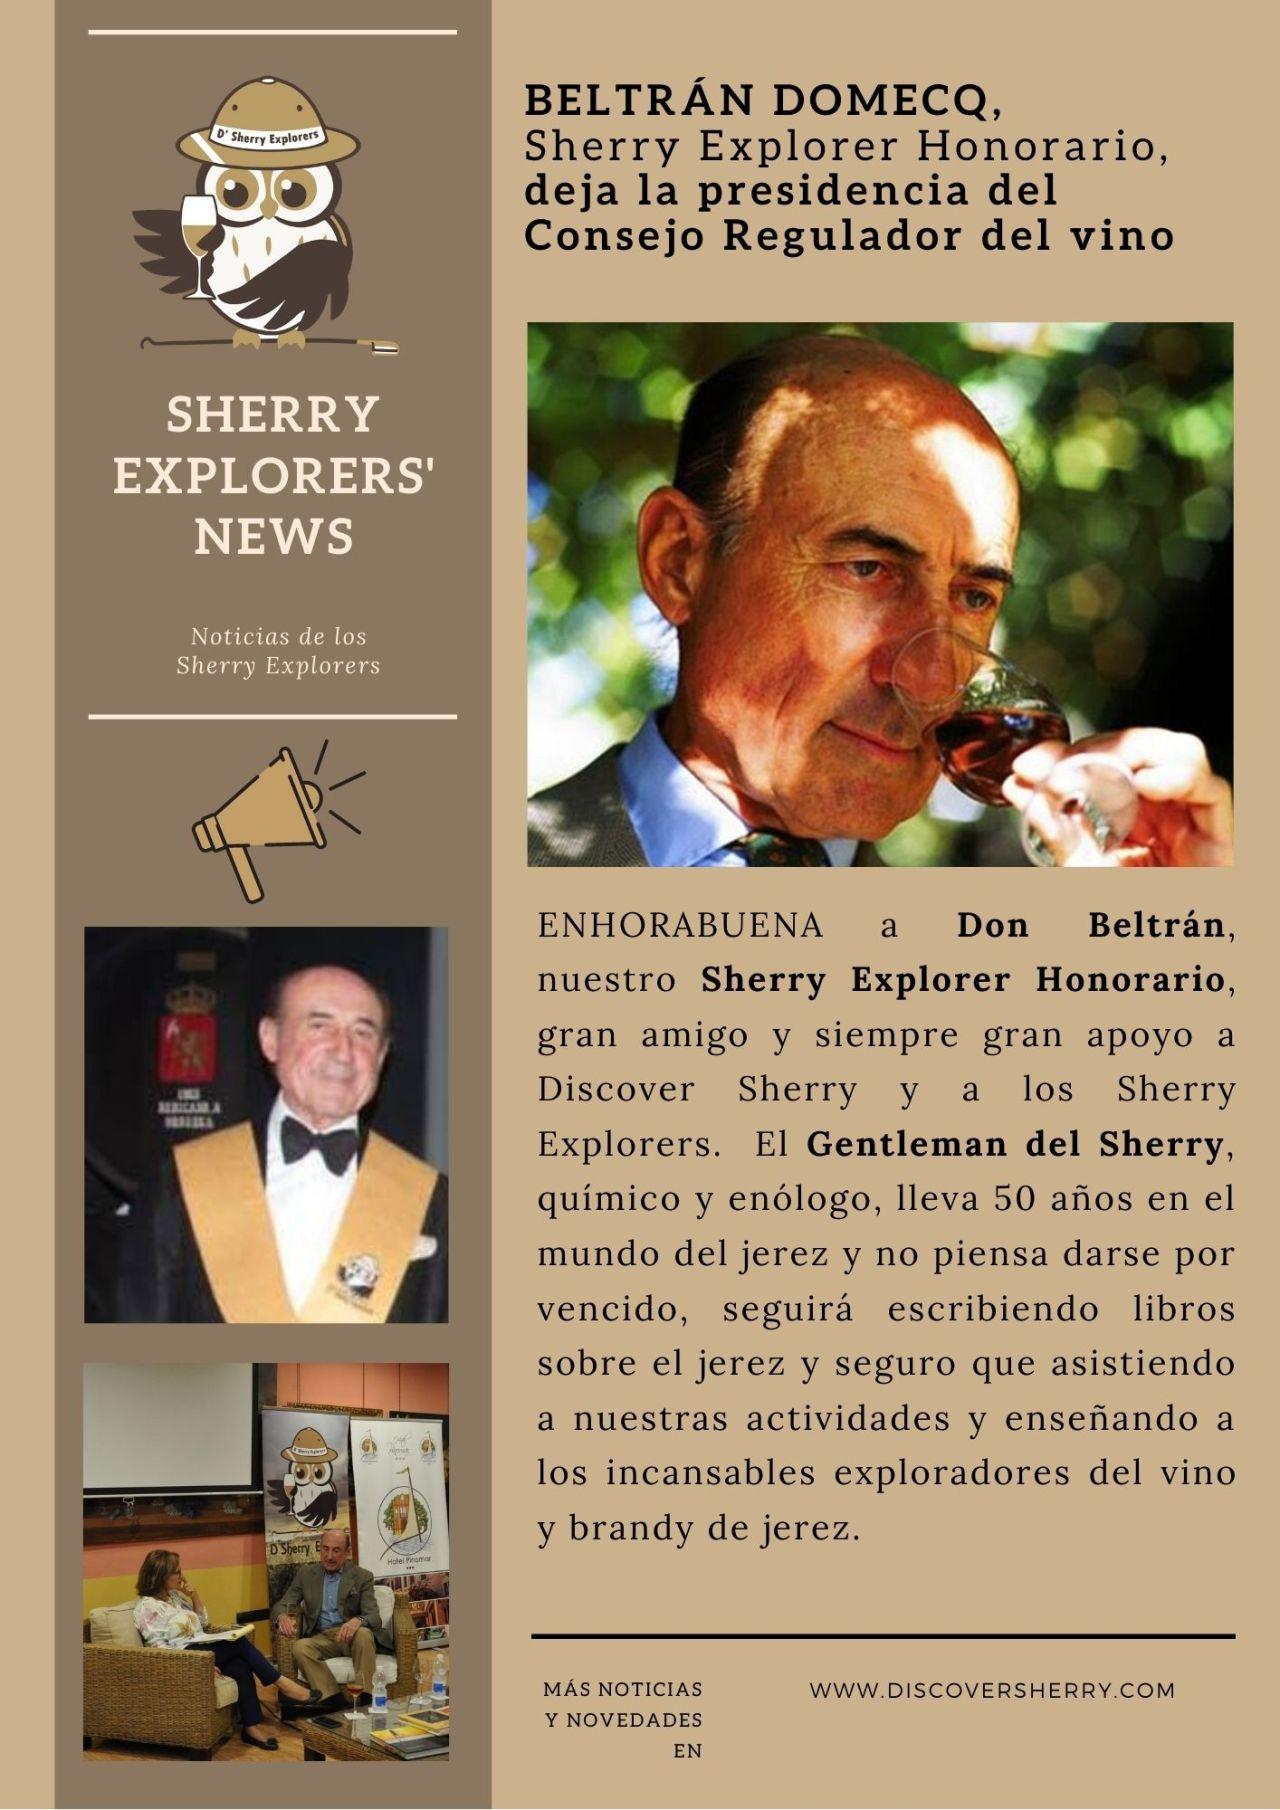 Sherry Explorers´ News: BeltránDomecq